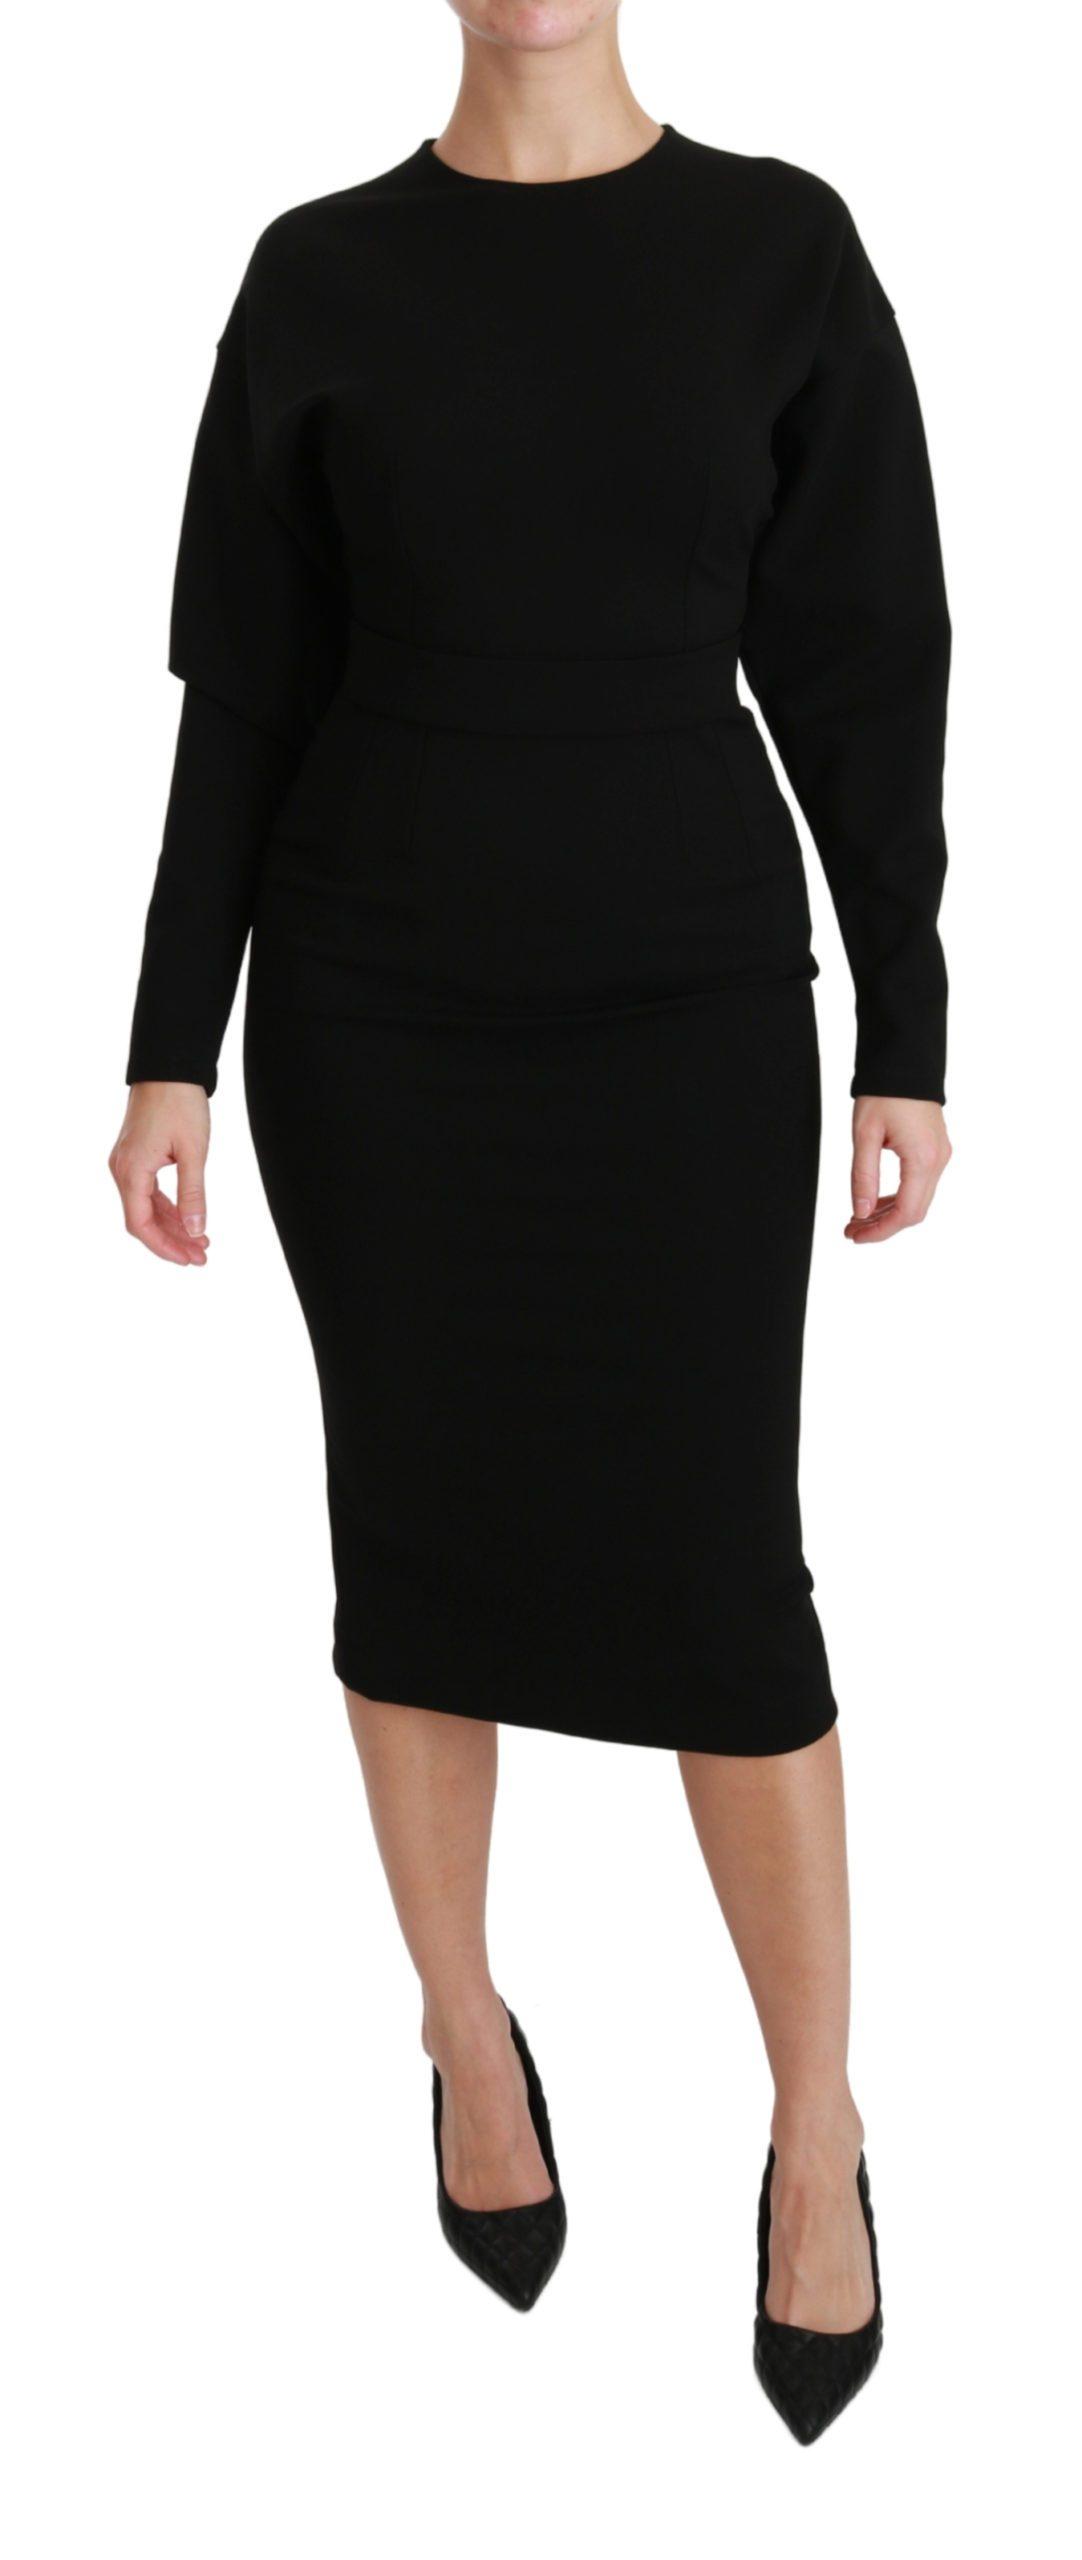 Dolce & Gabbana Women's Sheath Midi Stretch Dress Black DR2543 - IT40|S